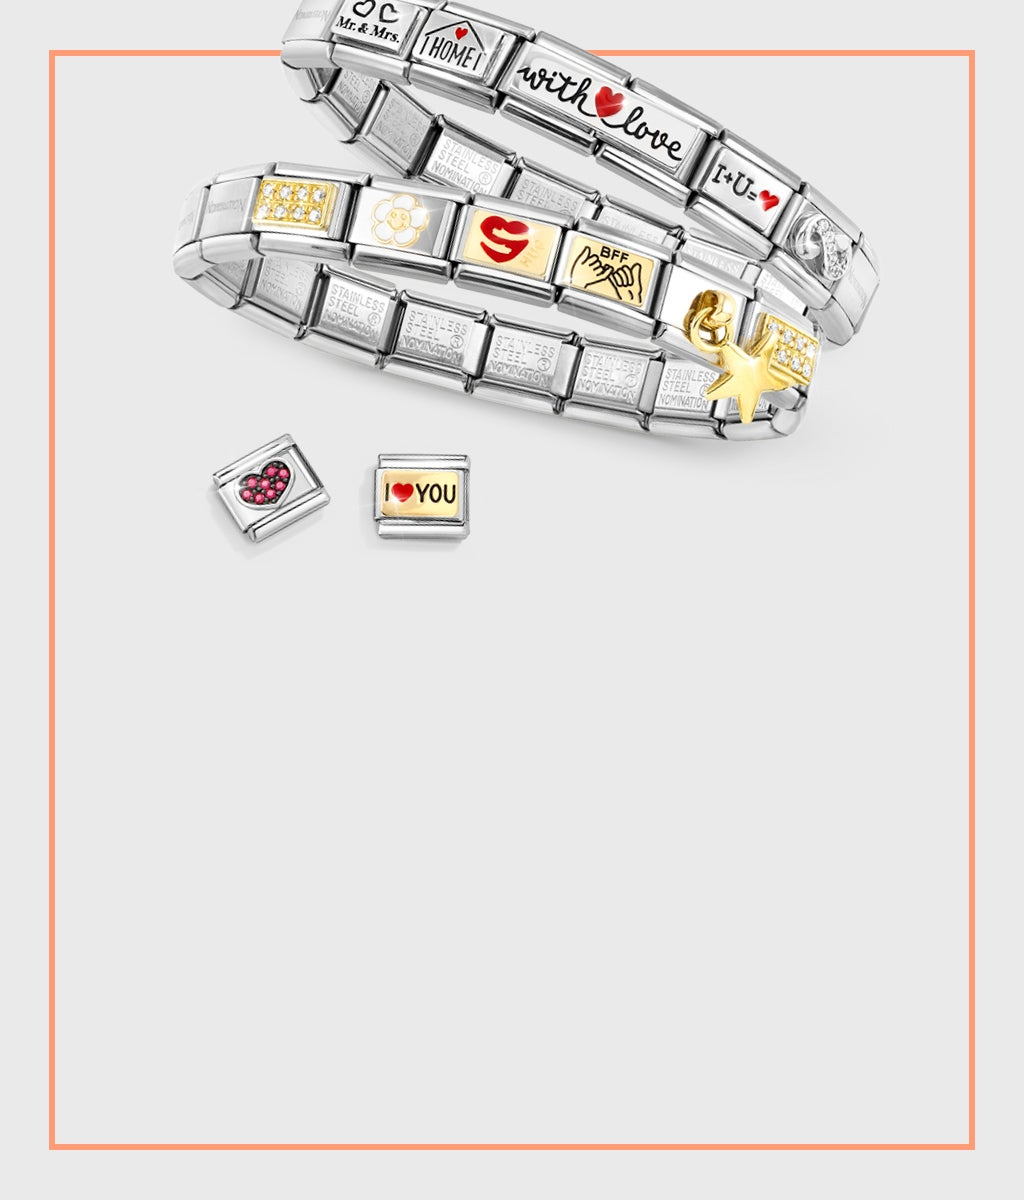 Complete your Bracelet FREE